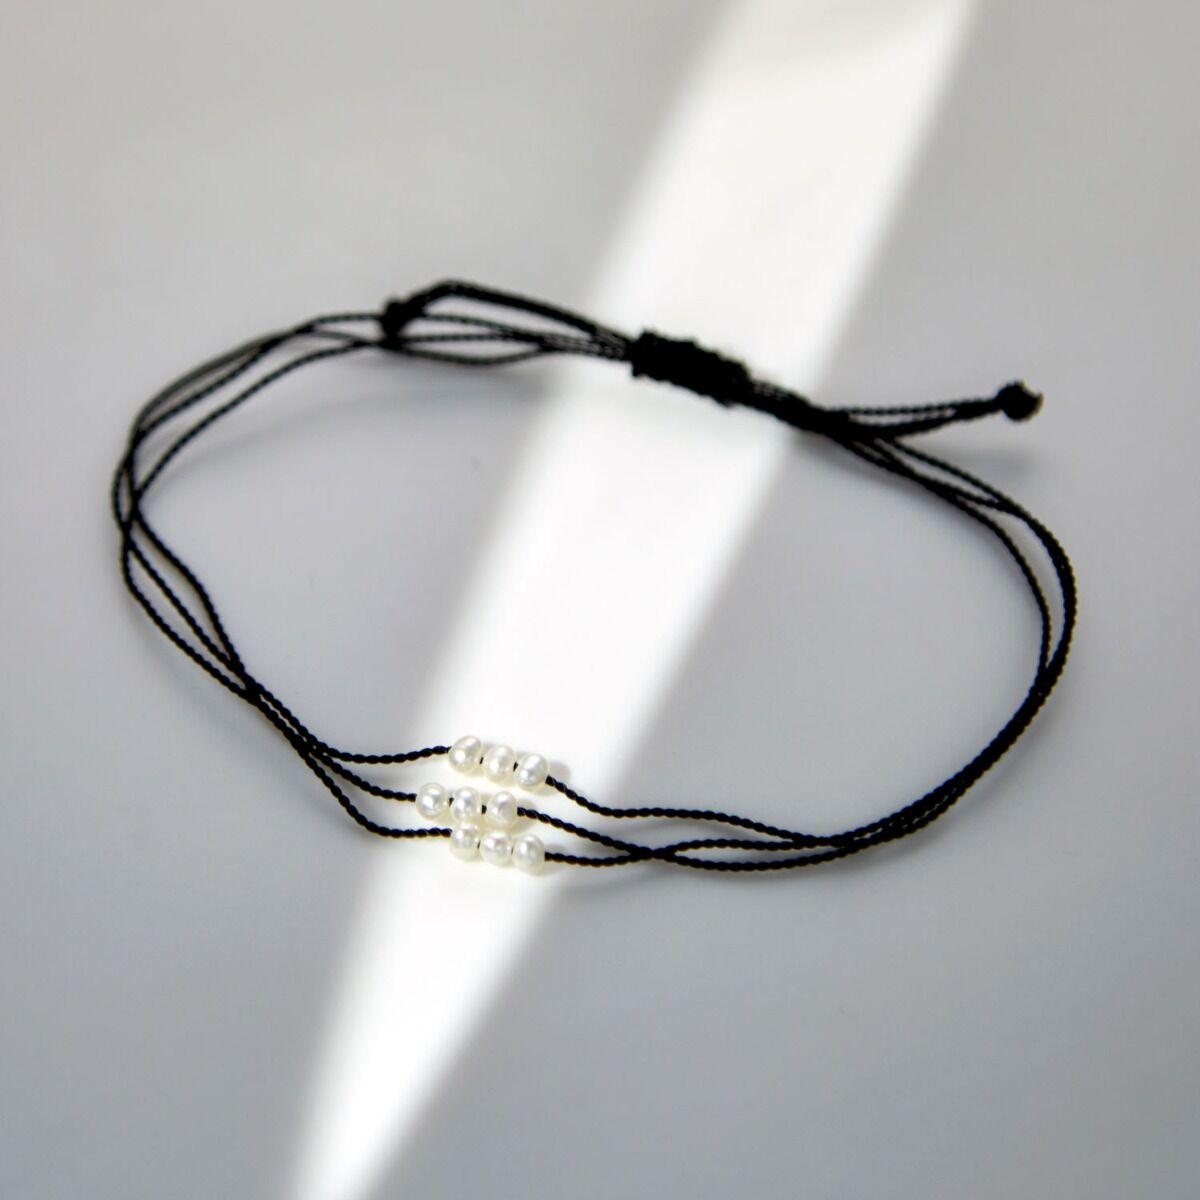 Friendship Bracelet With Pearls, Black image